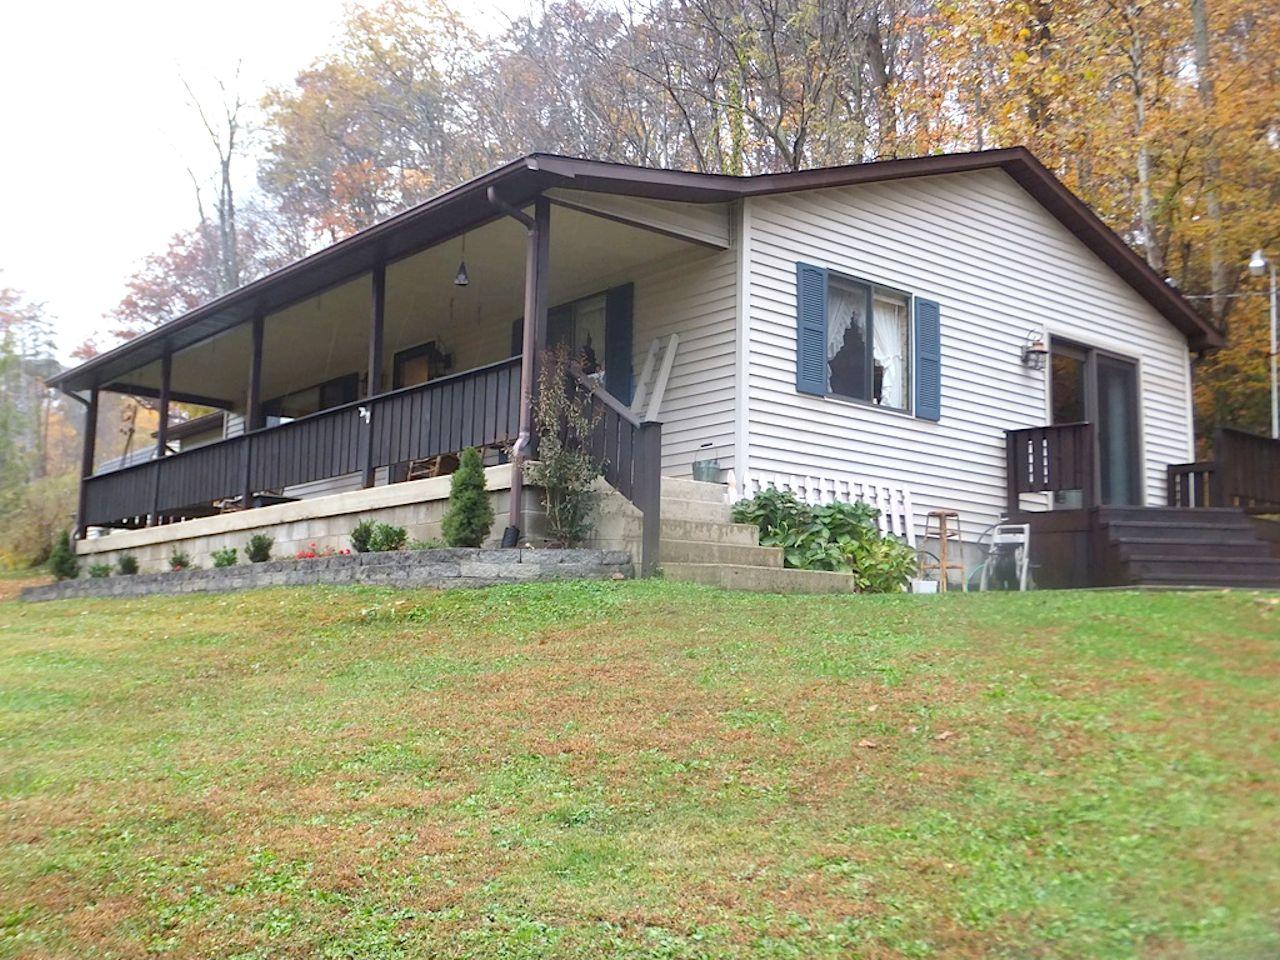 829 County Road 5, Kitts Hill, Ohio 45645